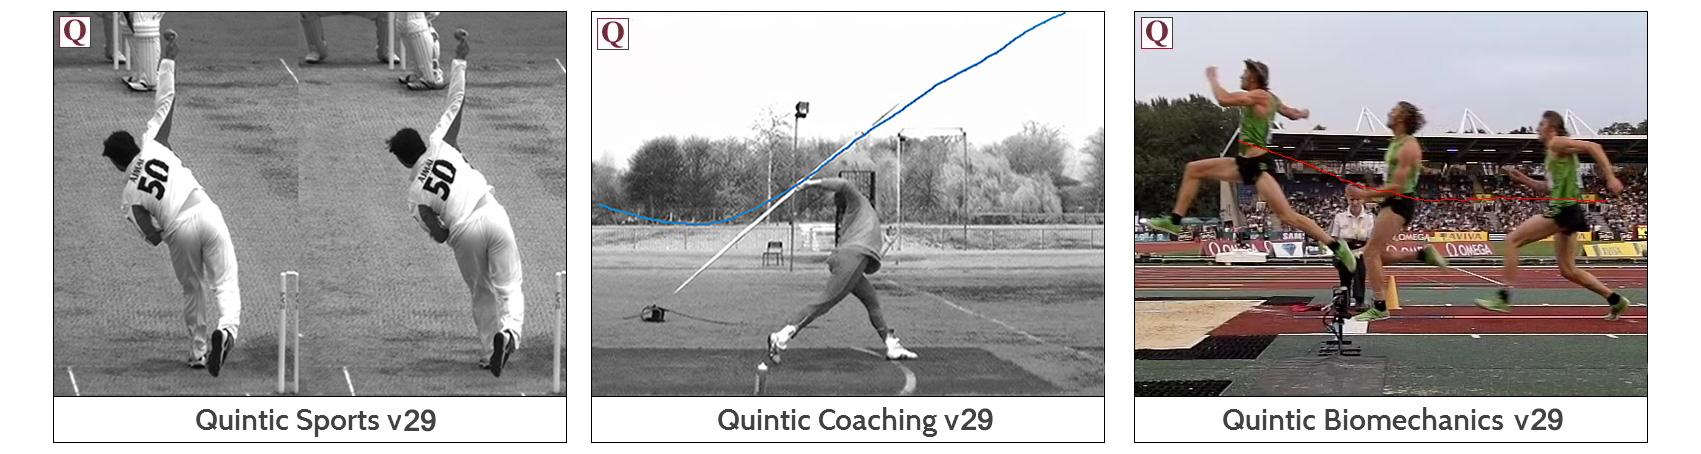 Quintic-Sports-1-v29